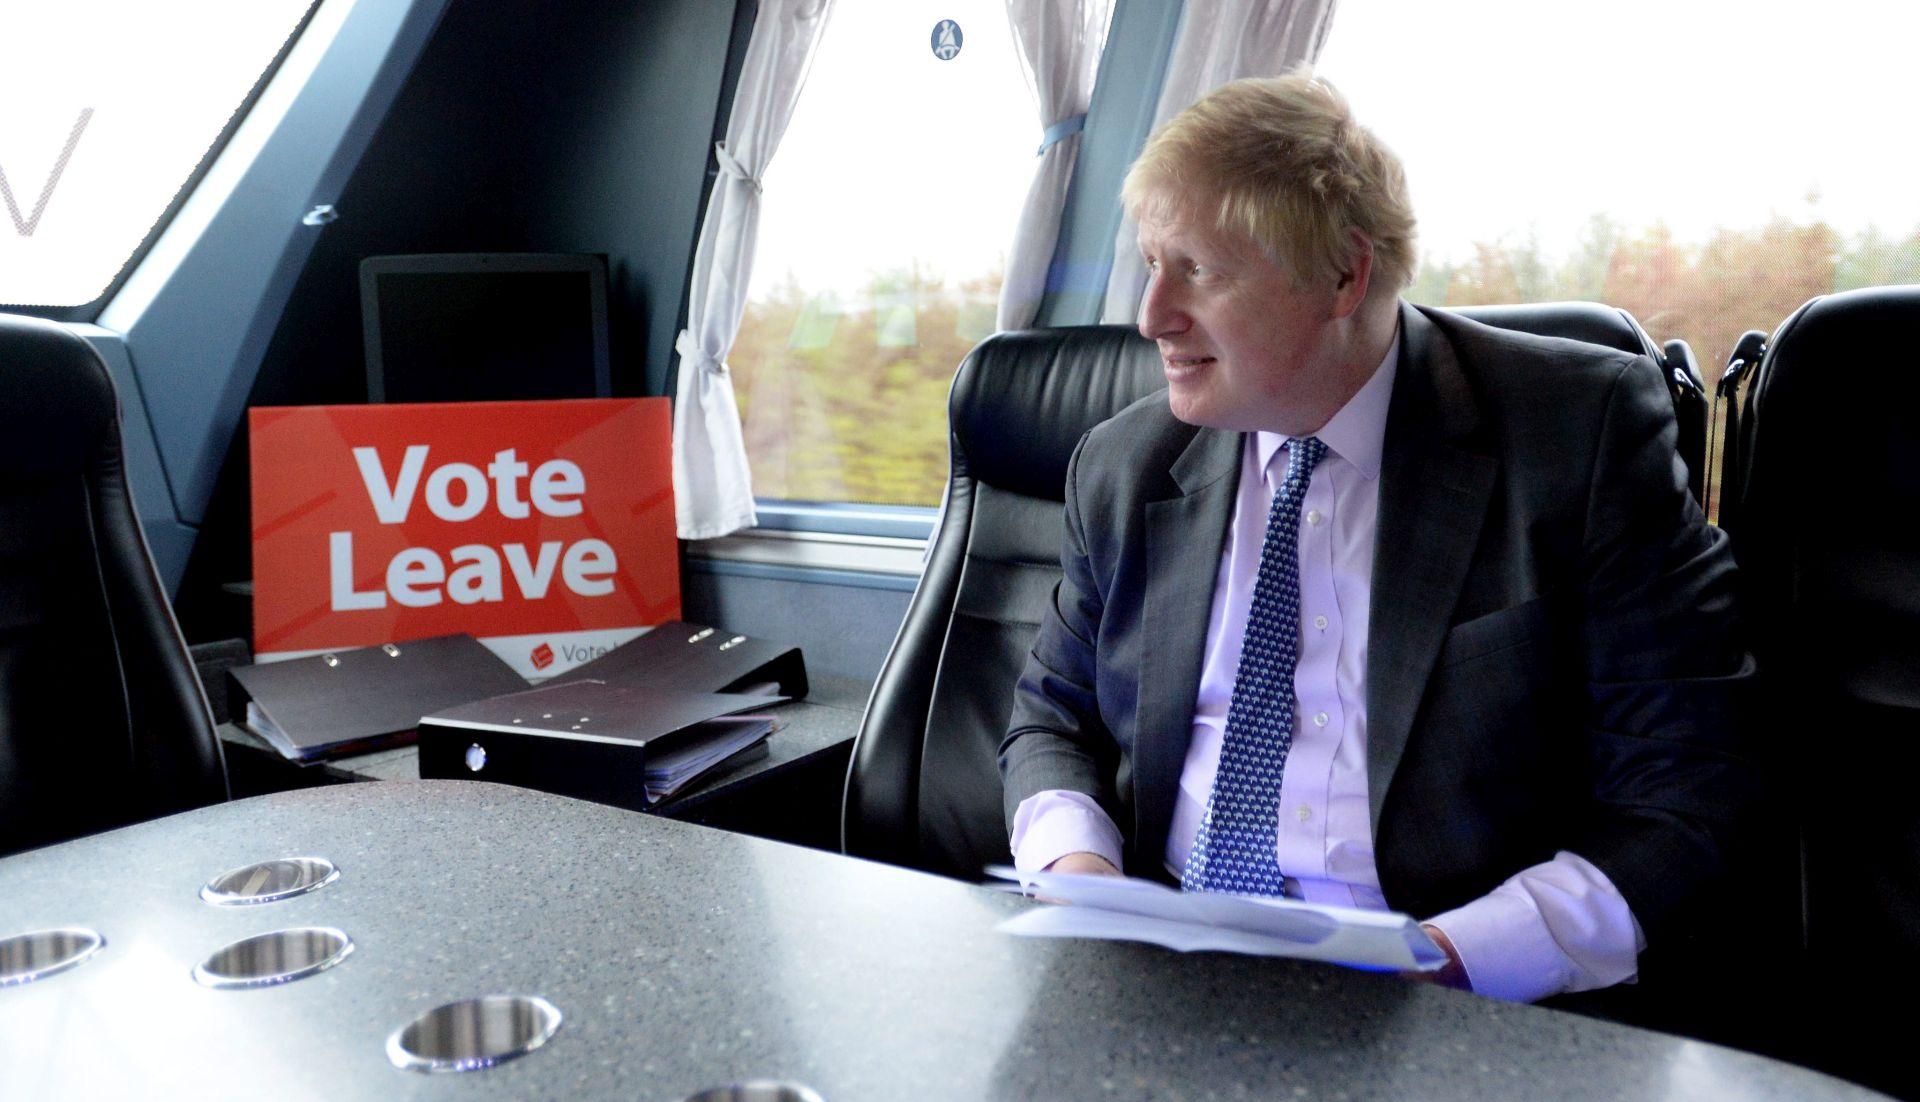 Bivši londonski gradonačelnik Boris Johnson usporedio ciljeve EU-a s Hitlerovim